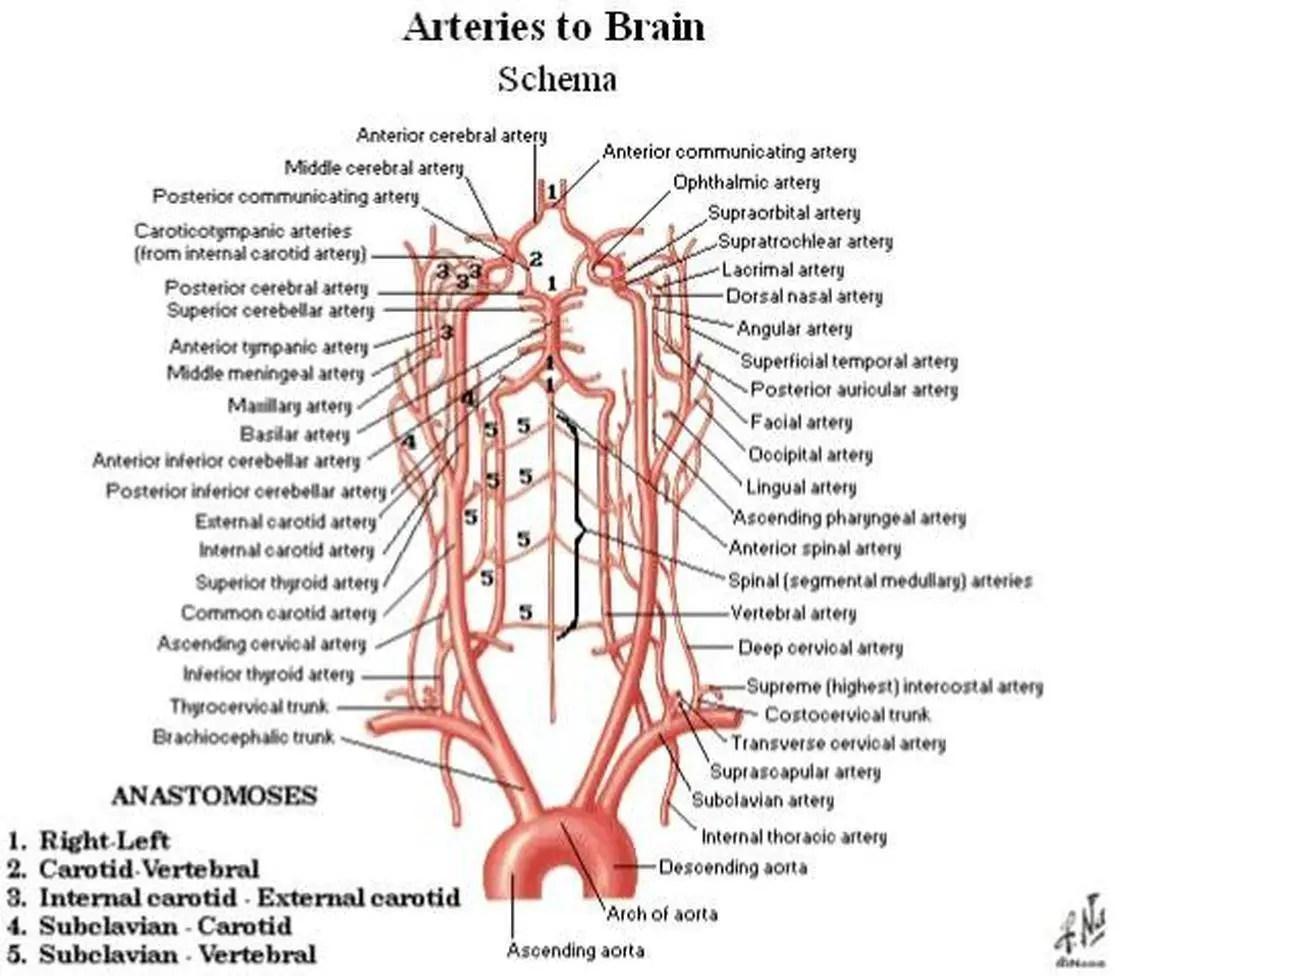 carotid artery diagram acura tl radio wiring pictures of brachiocephalic